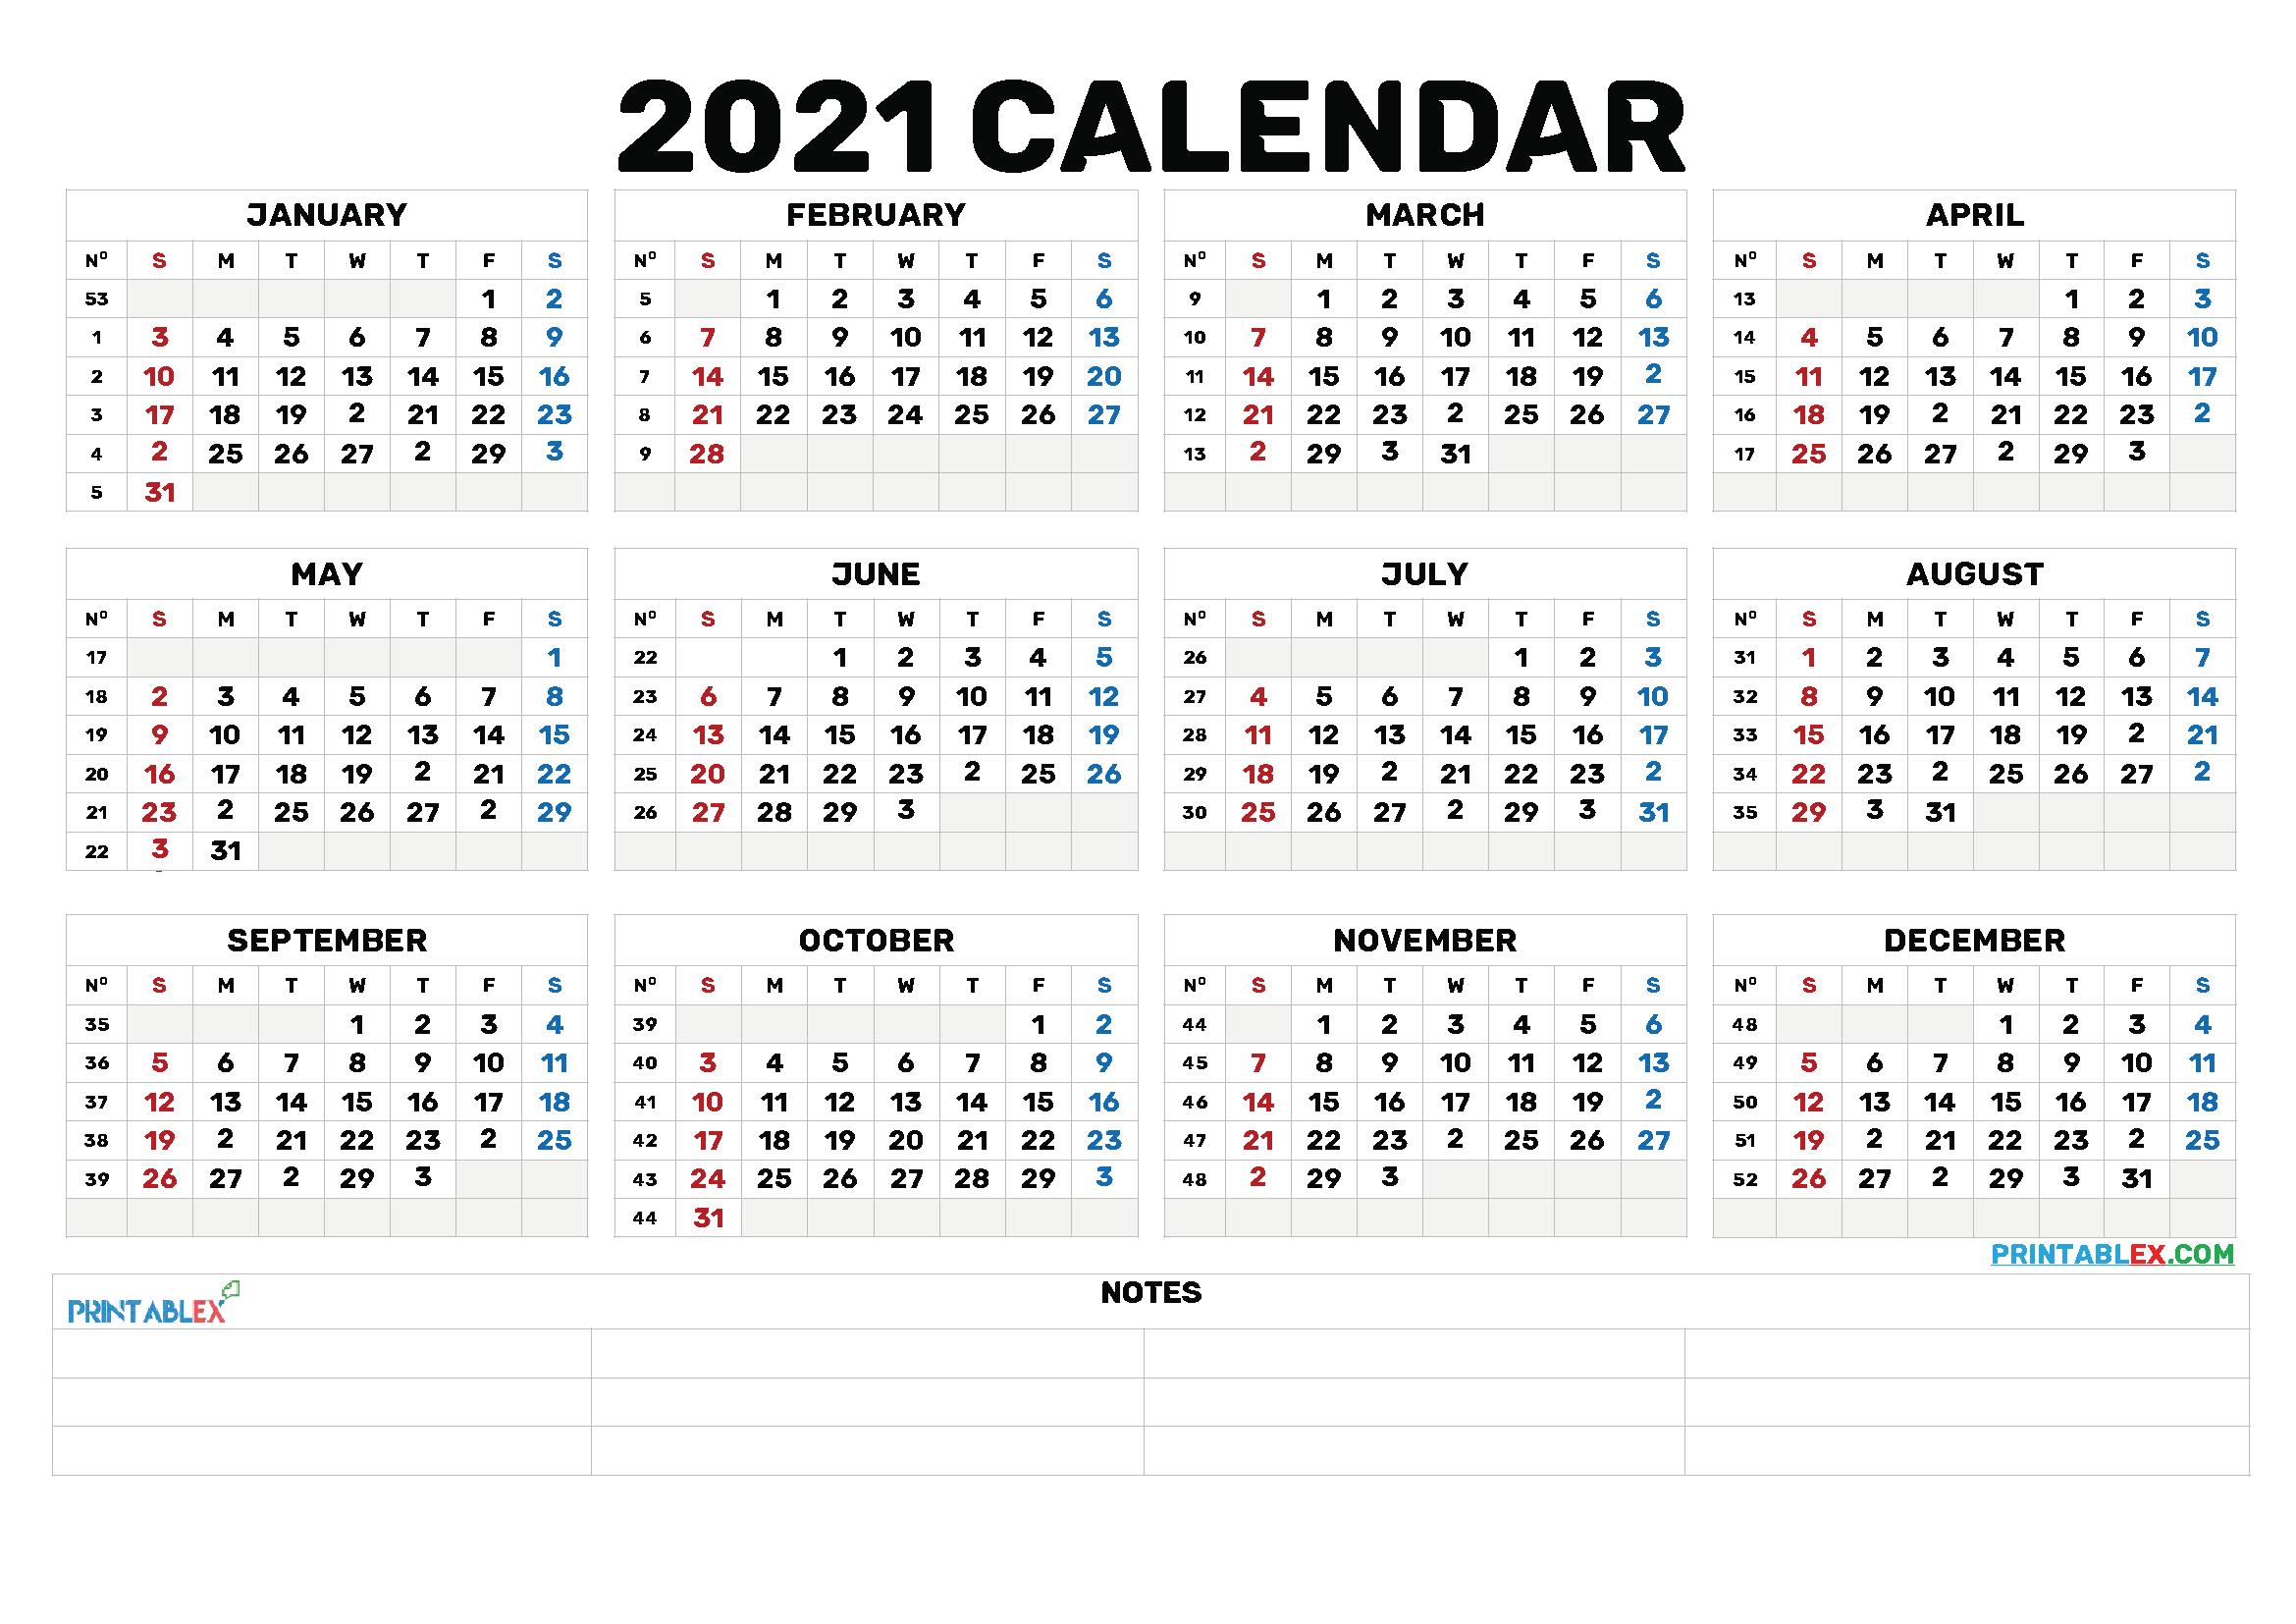 2021 Annual Calendar Printable Calendars 2021